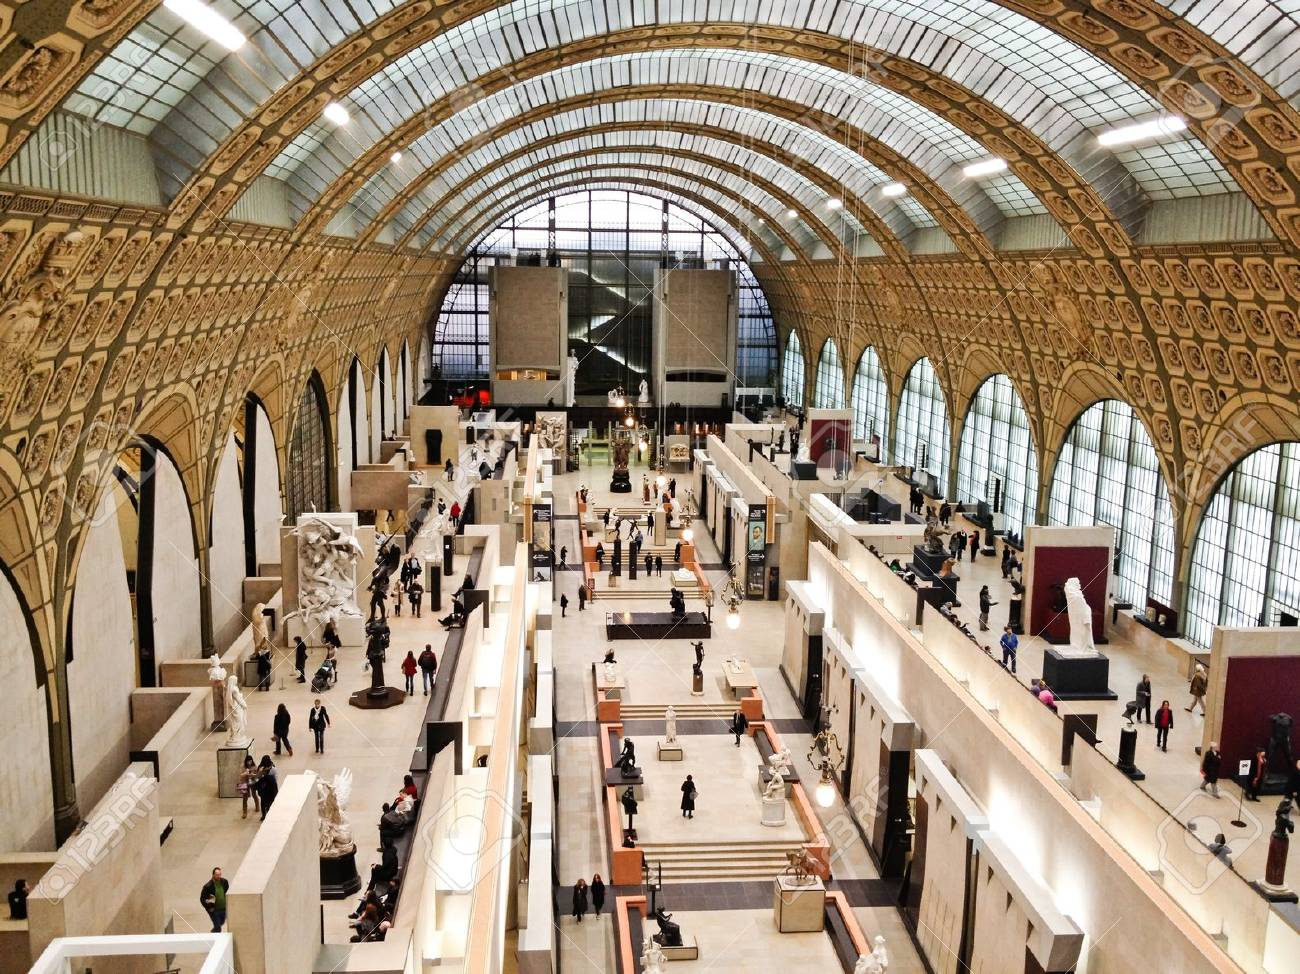 Paris, France - Jan 14, 2012: Paris, France - Image of the interior of the Mus?de Orsay in Paris, France. Stock Photo - 16309754